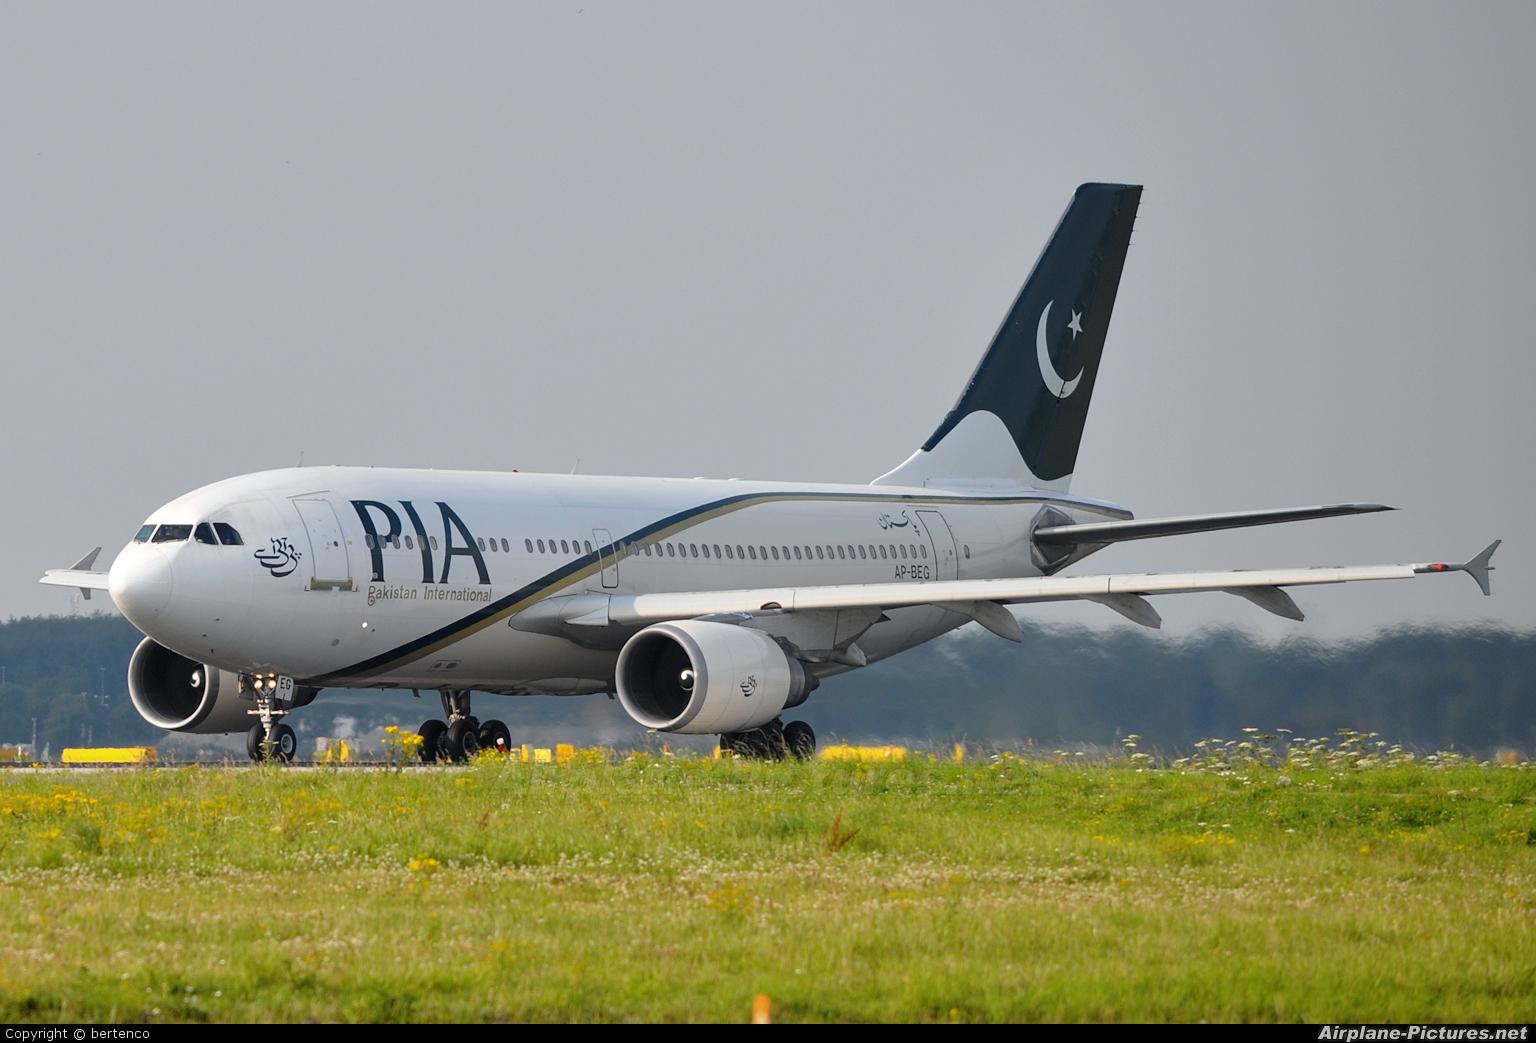 PIA - Pakistan International Airlines AP-BEG aircraft at Amsterdam - Schiphol